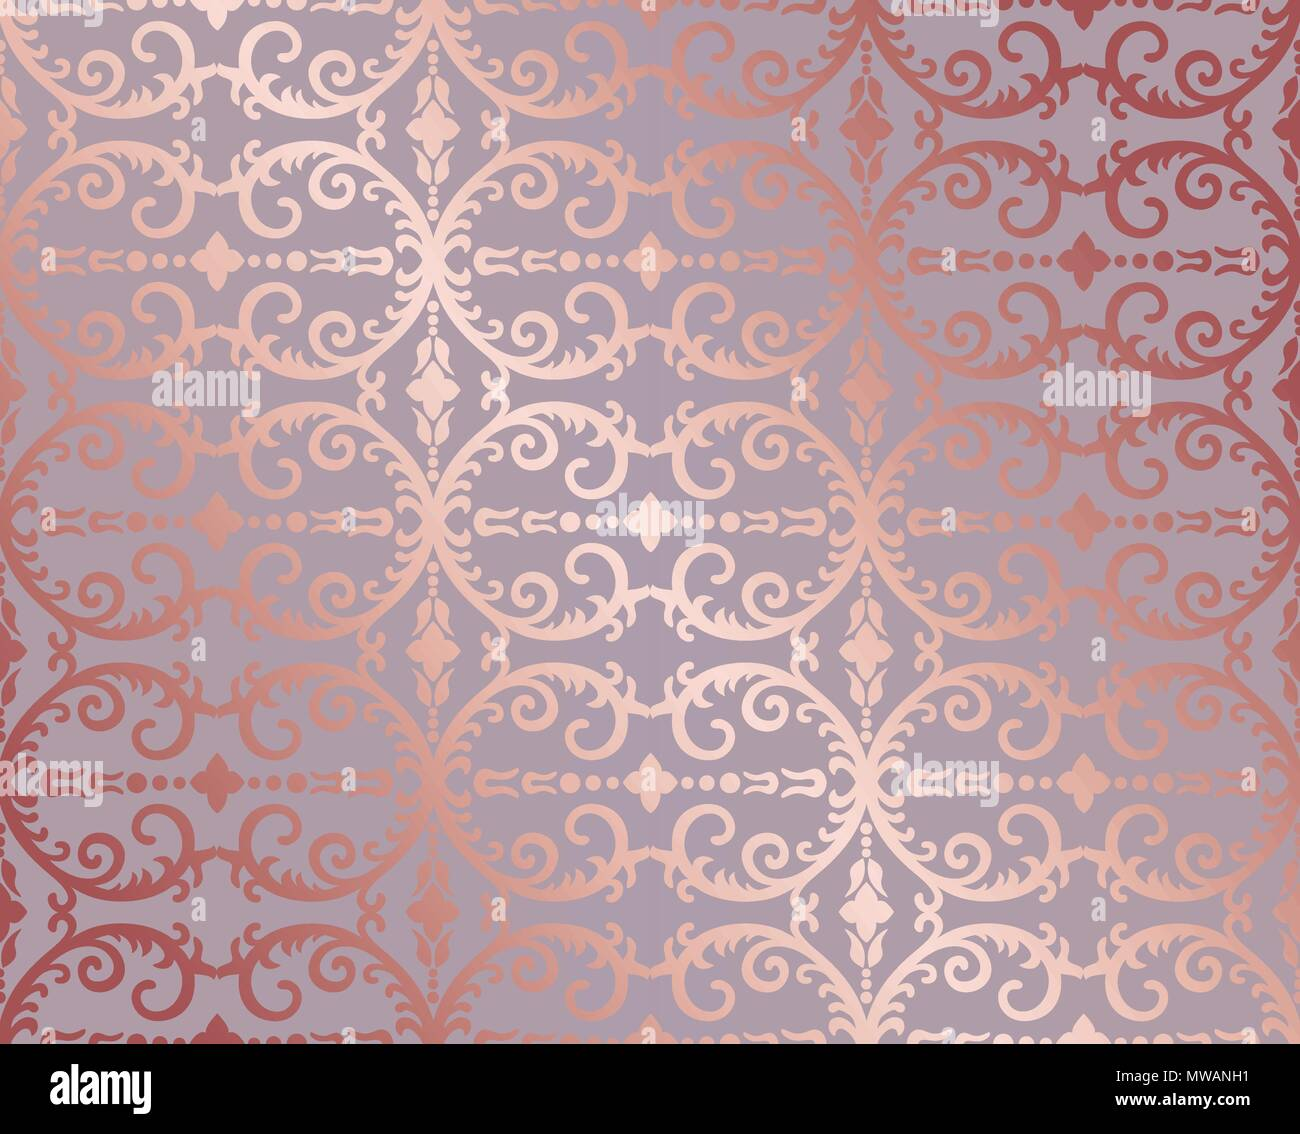 rose gold vector vectors stockfotos rose gold vector vectors bilder alamy. Black Bedroom Furniture Sets. Home Design Ideas